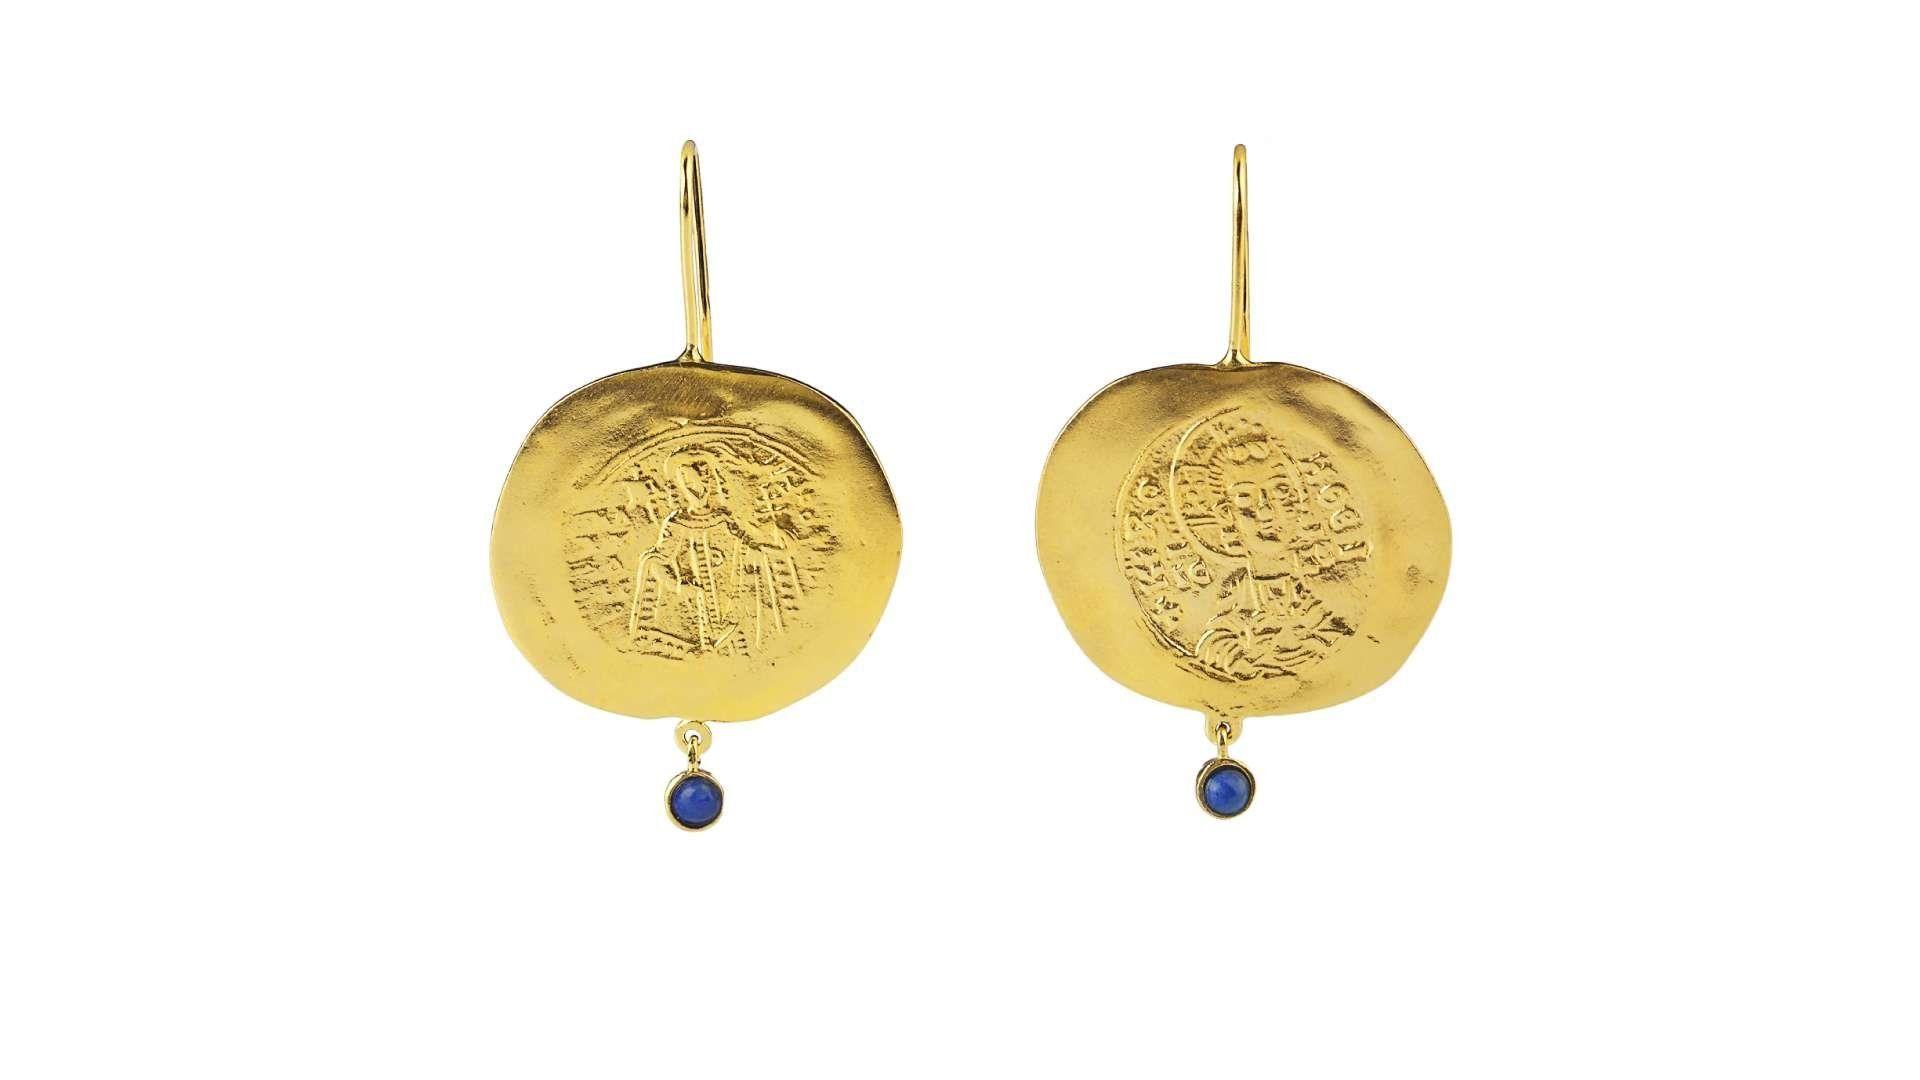 constantinato earrings bleu stone danai gianelli_high